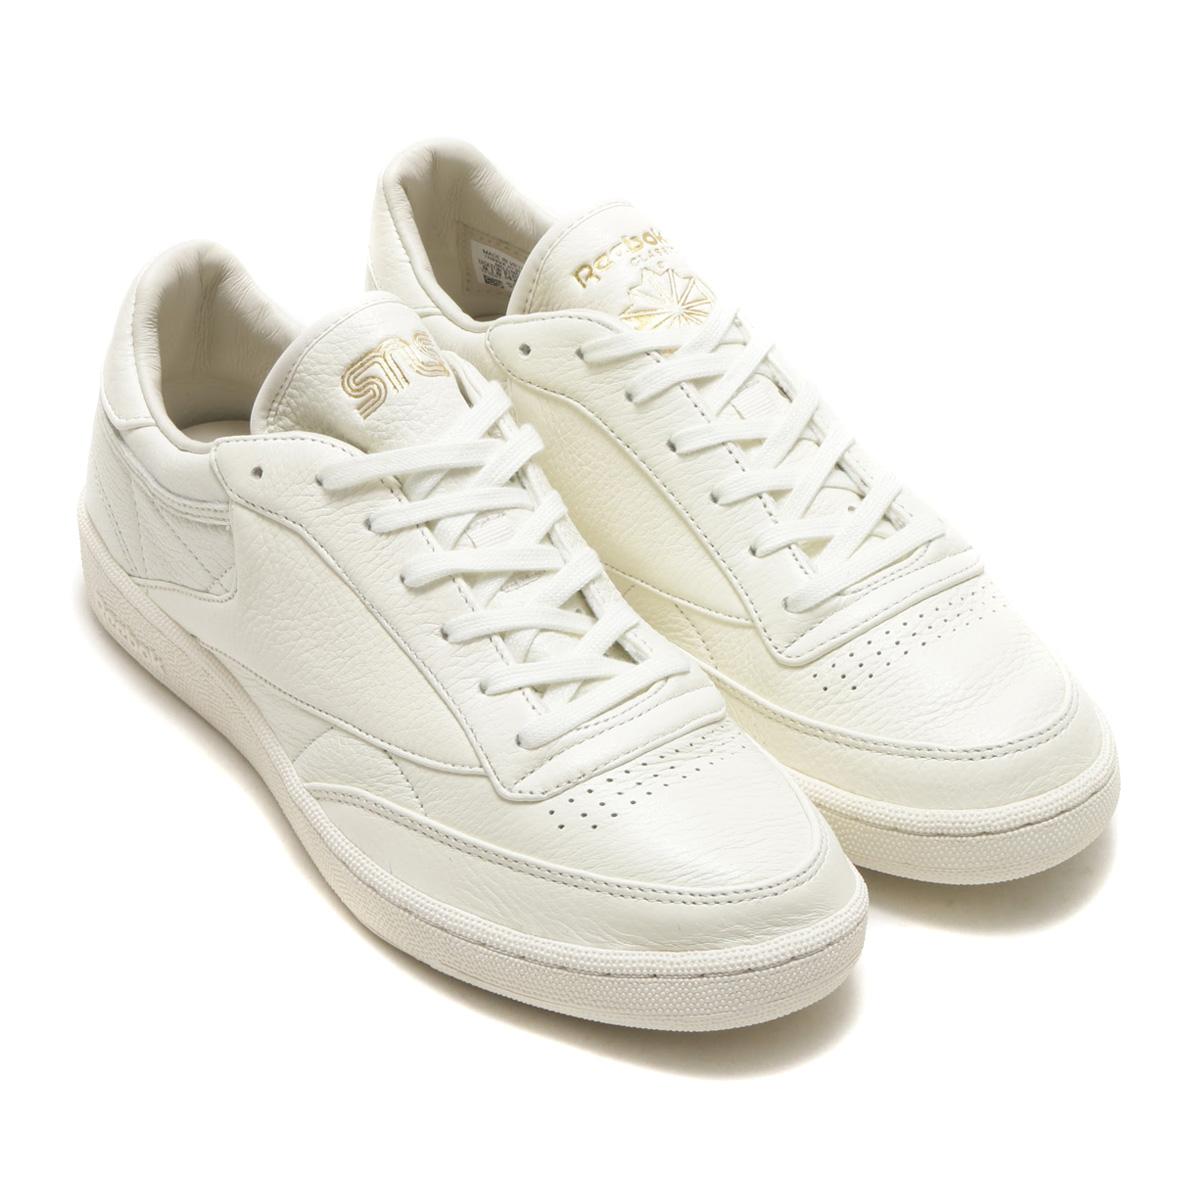 f7cf427d3c2b5 Reebok CLASSIC (Reebok classical music) sneakers.